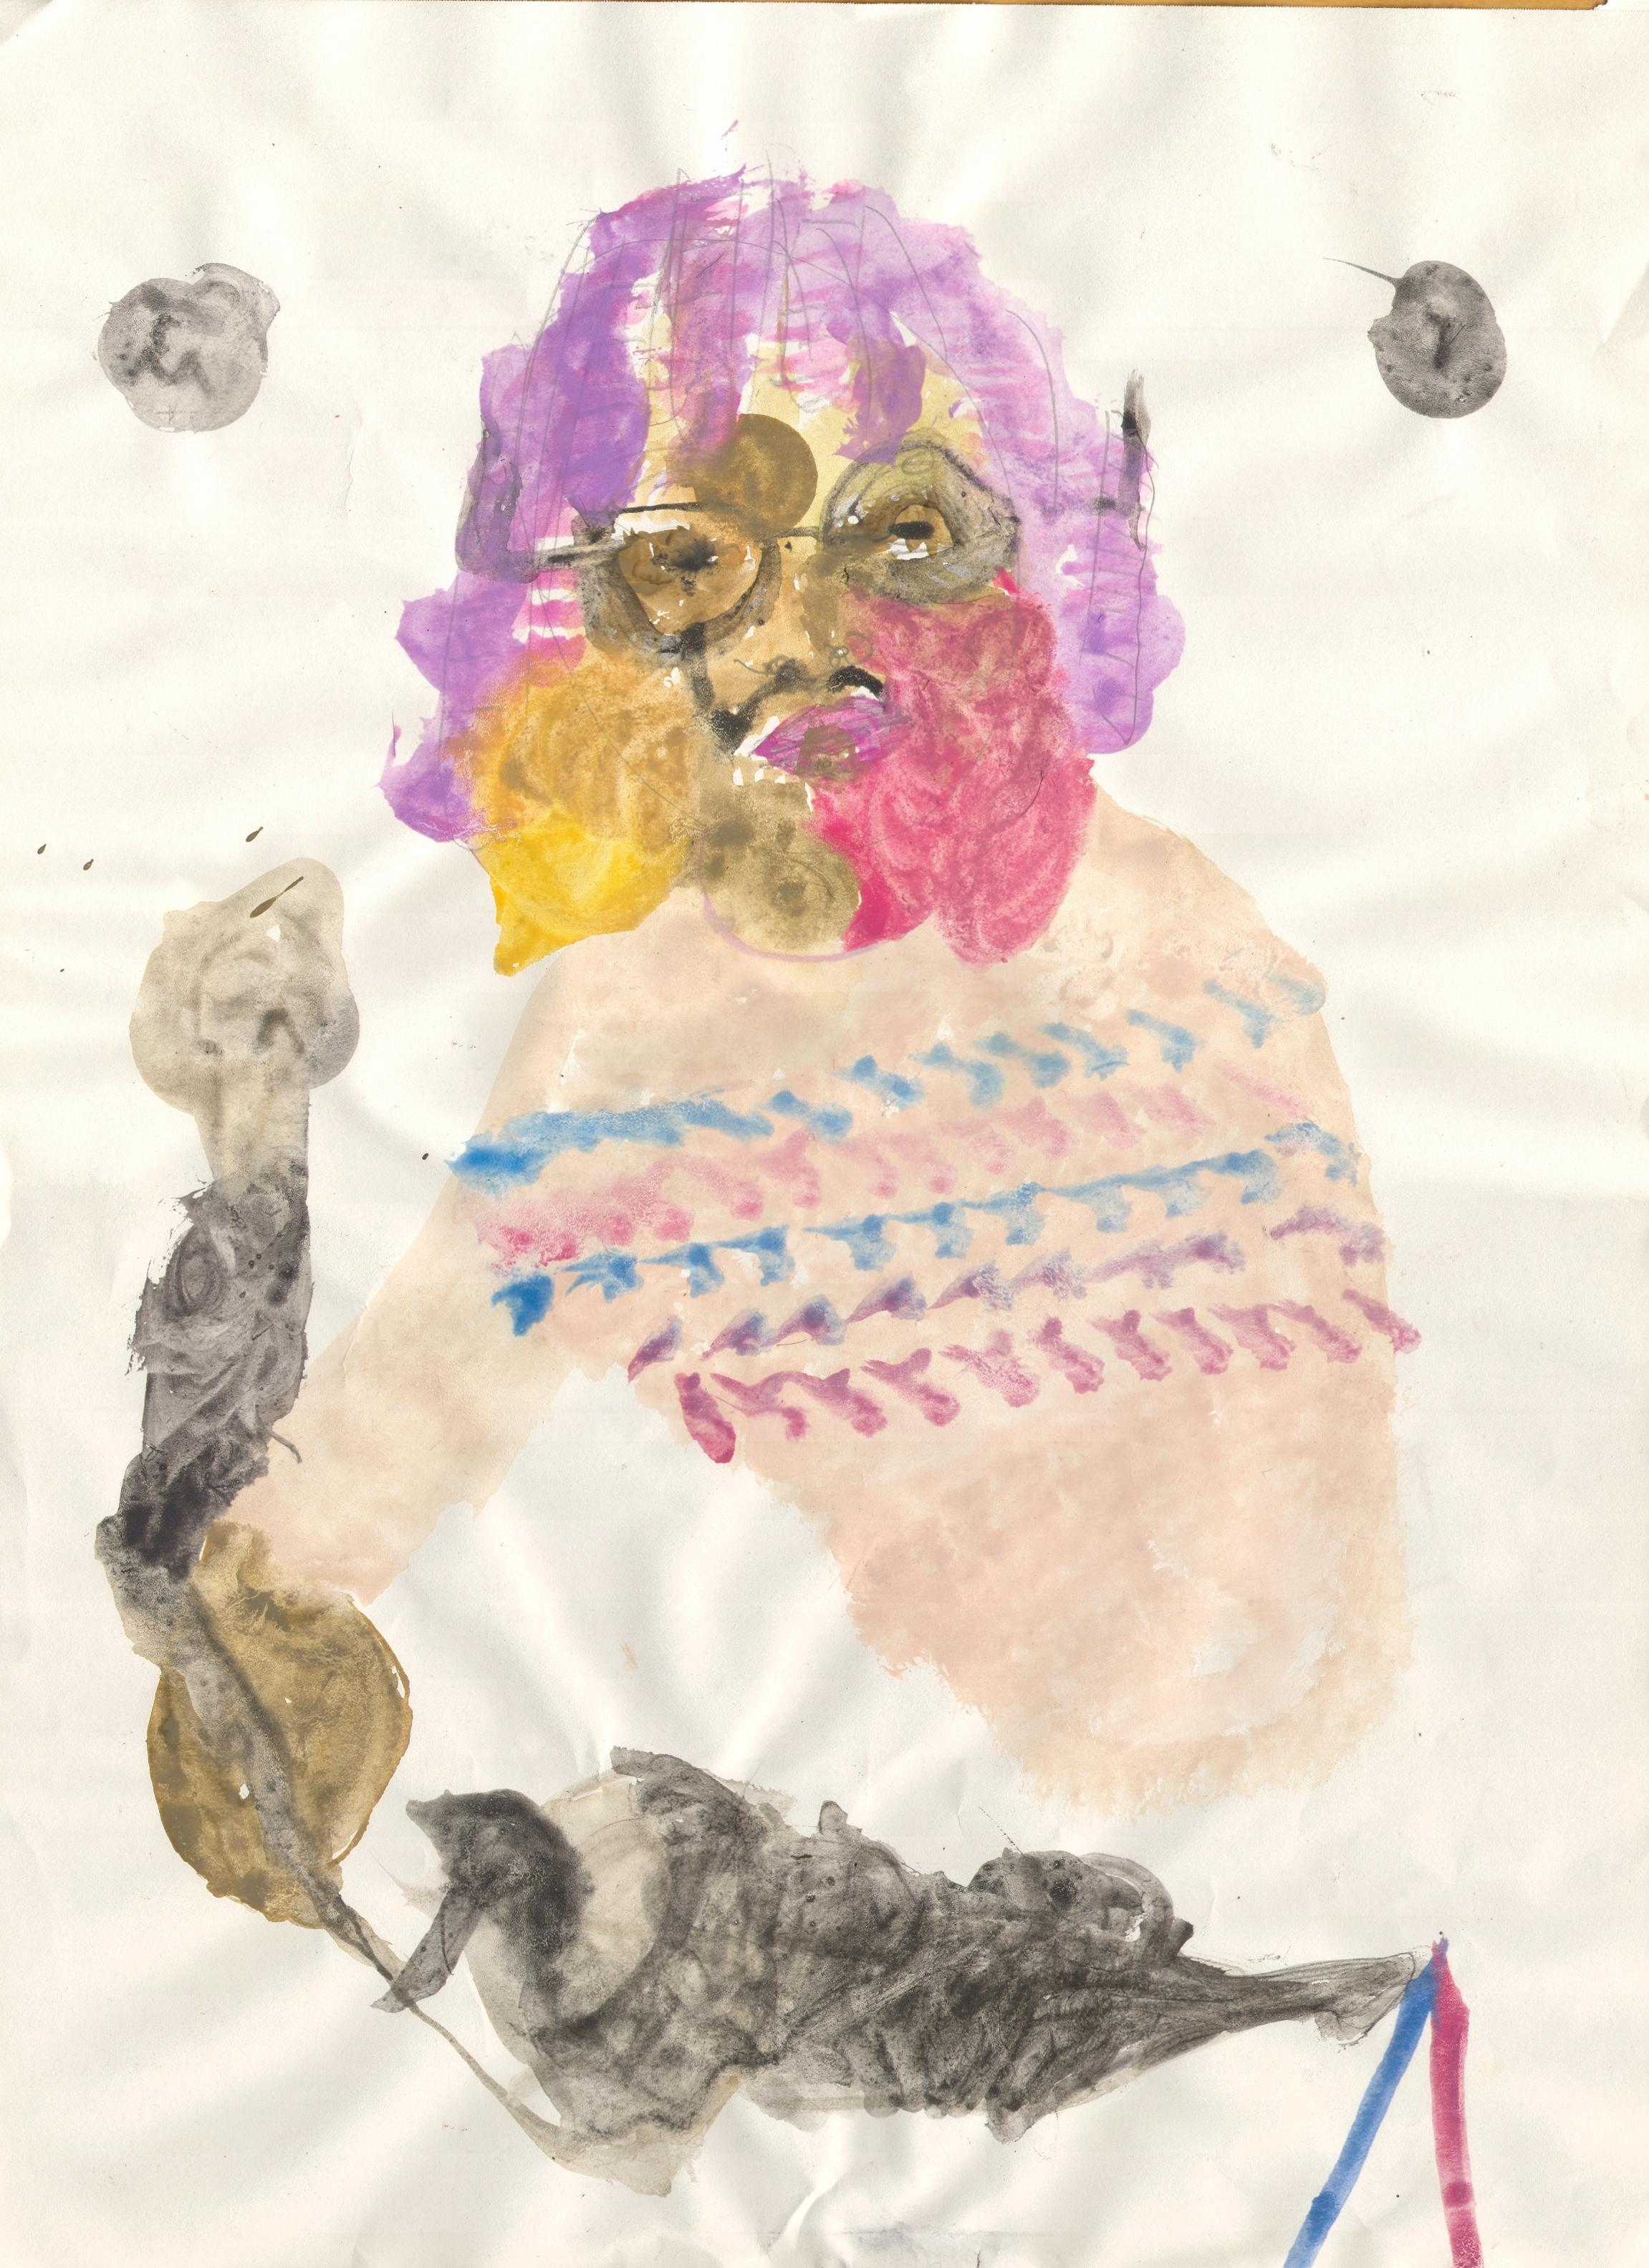 O.T. ( Selbstportrait ), 2018  Tempera Papier, 40.5x29.2cm